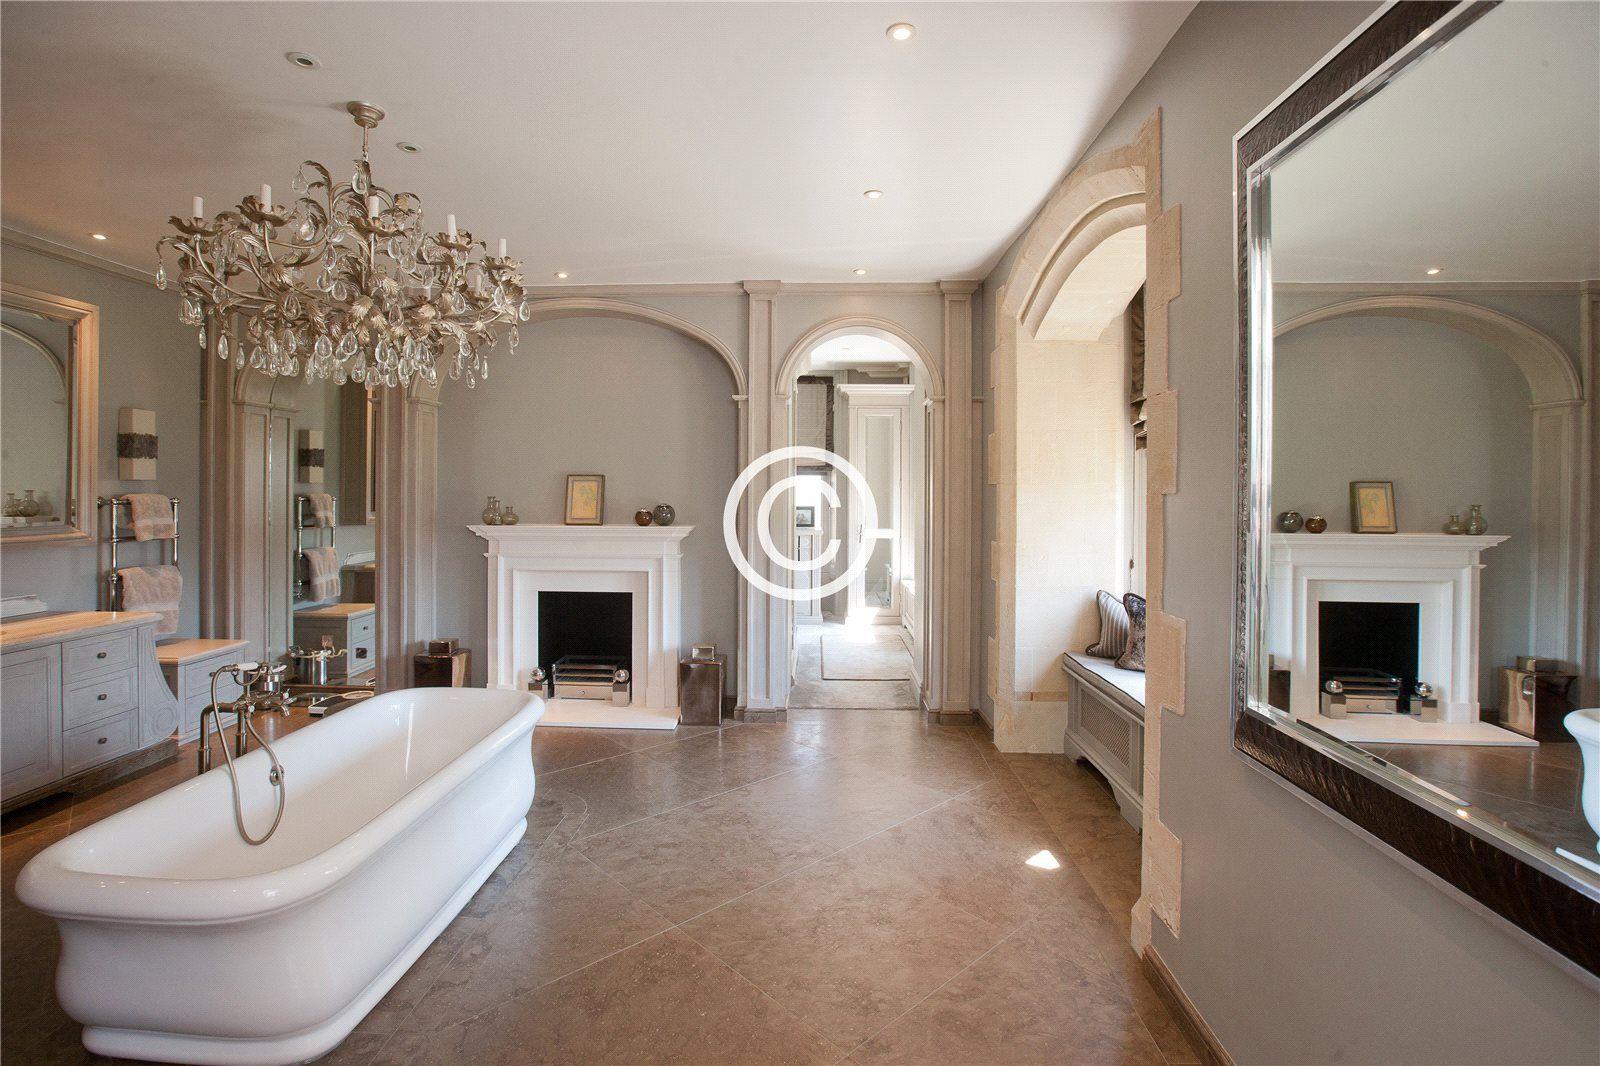 North Aston Hall - Master Bathroom